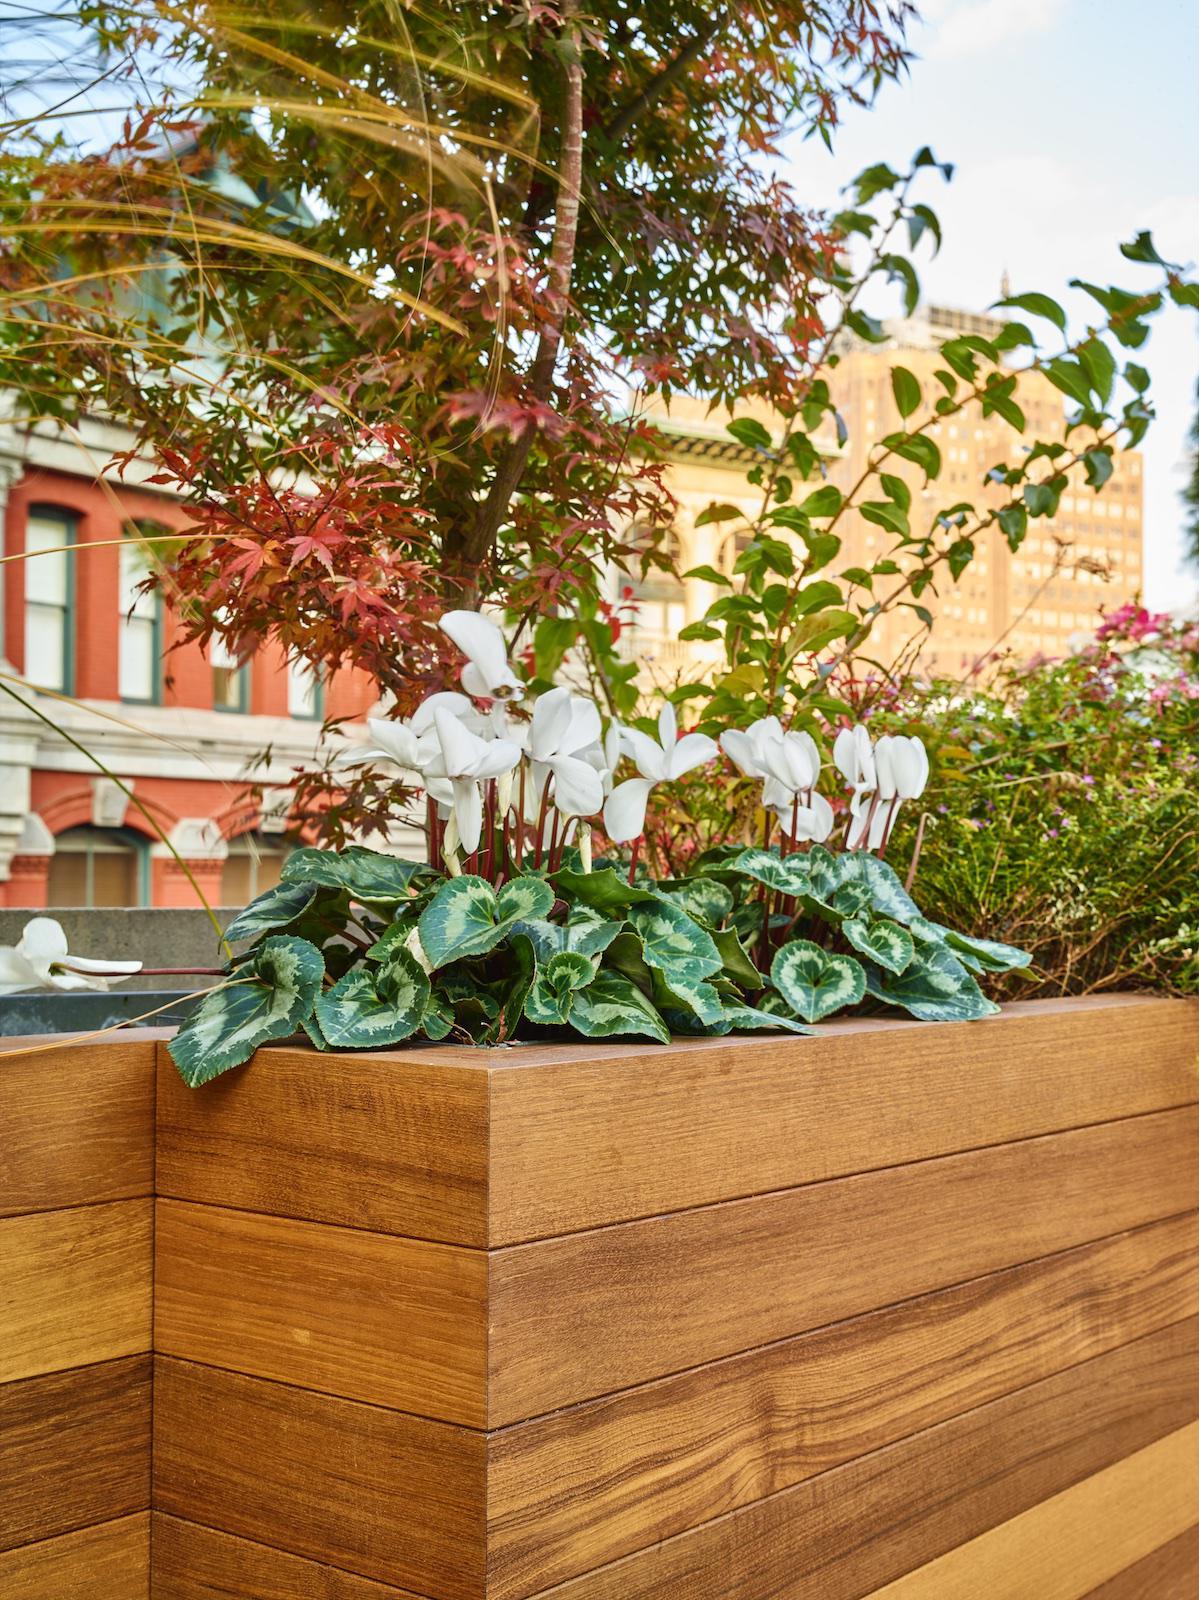 Schiller_TribecaRooftop-10-1 strategic design consultancy